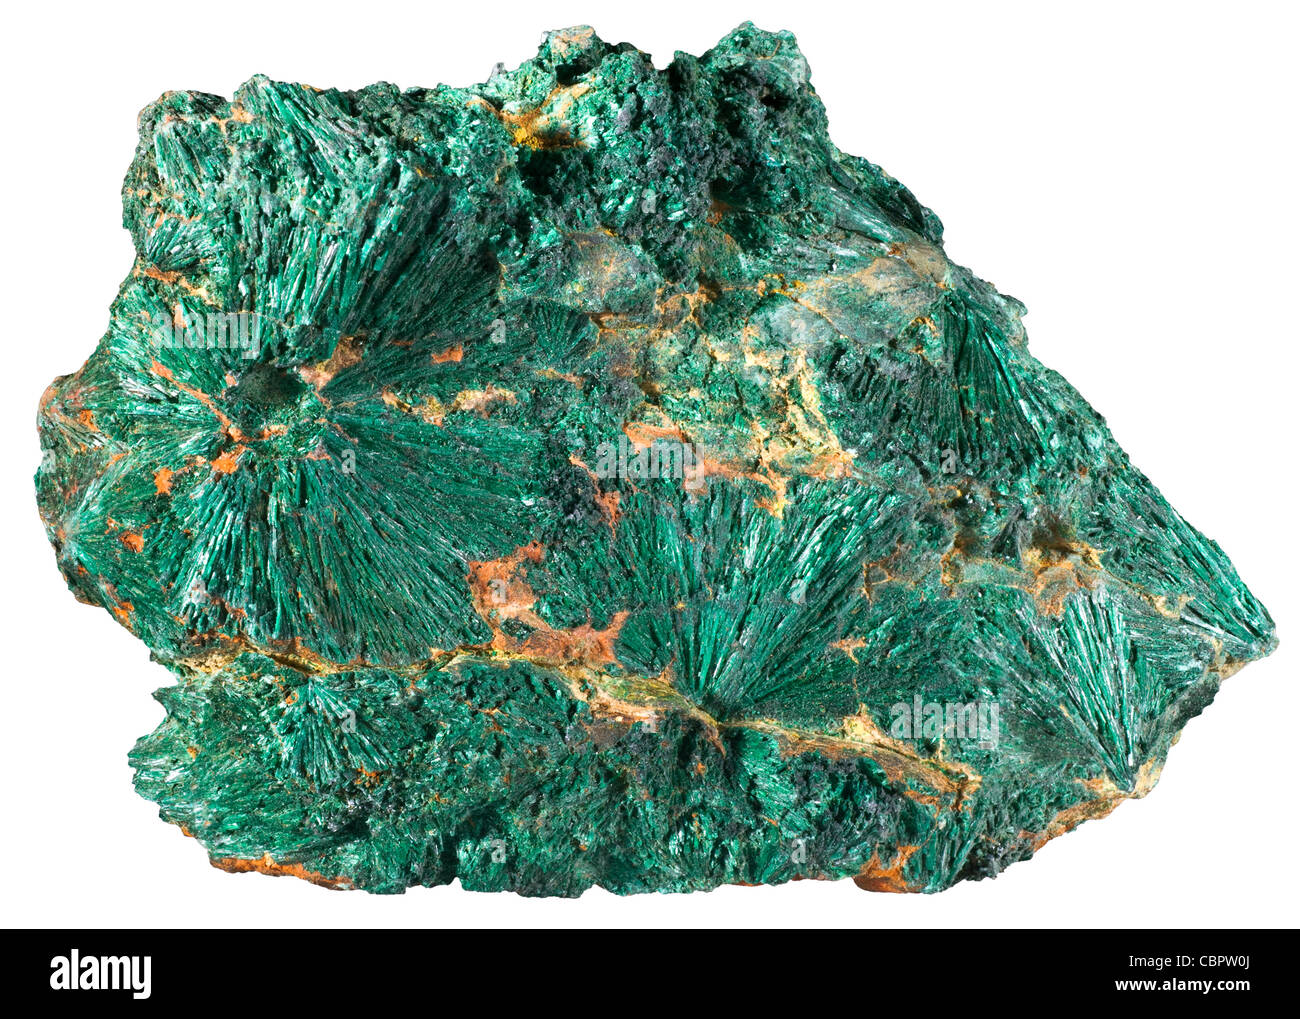 Fibrous Malachite from the Copper Queen Mine, Bisbee, Arizona - Stock Image